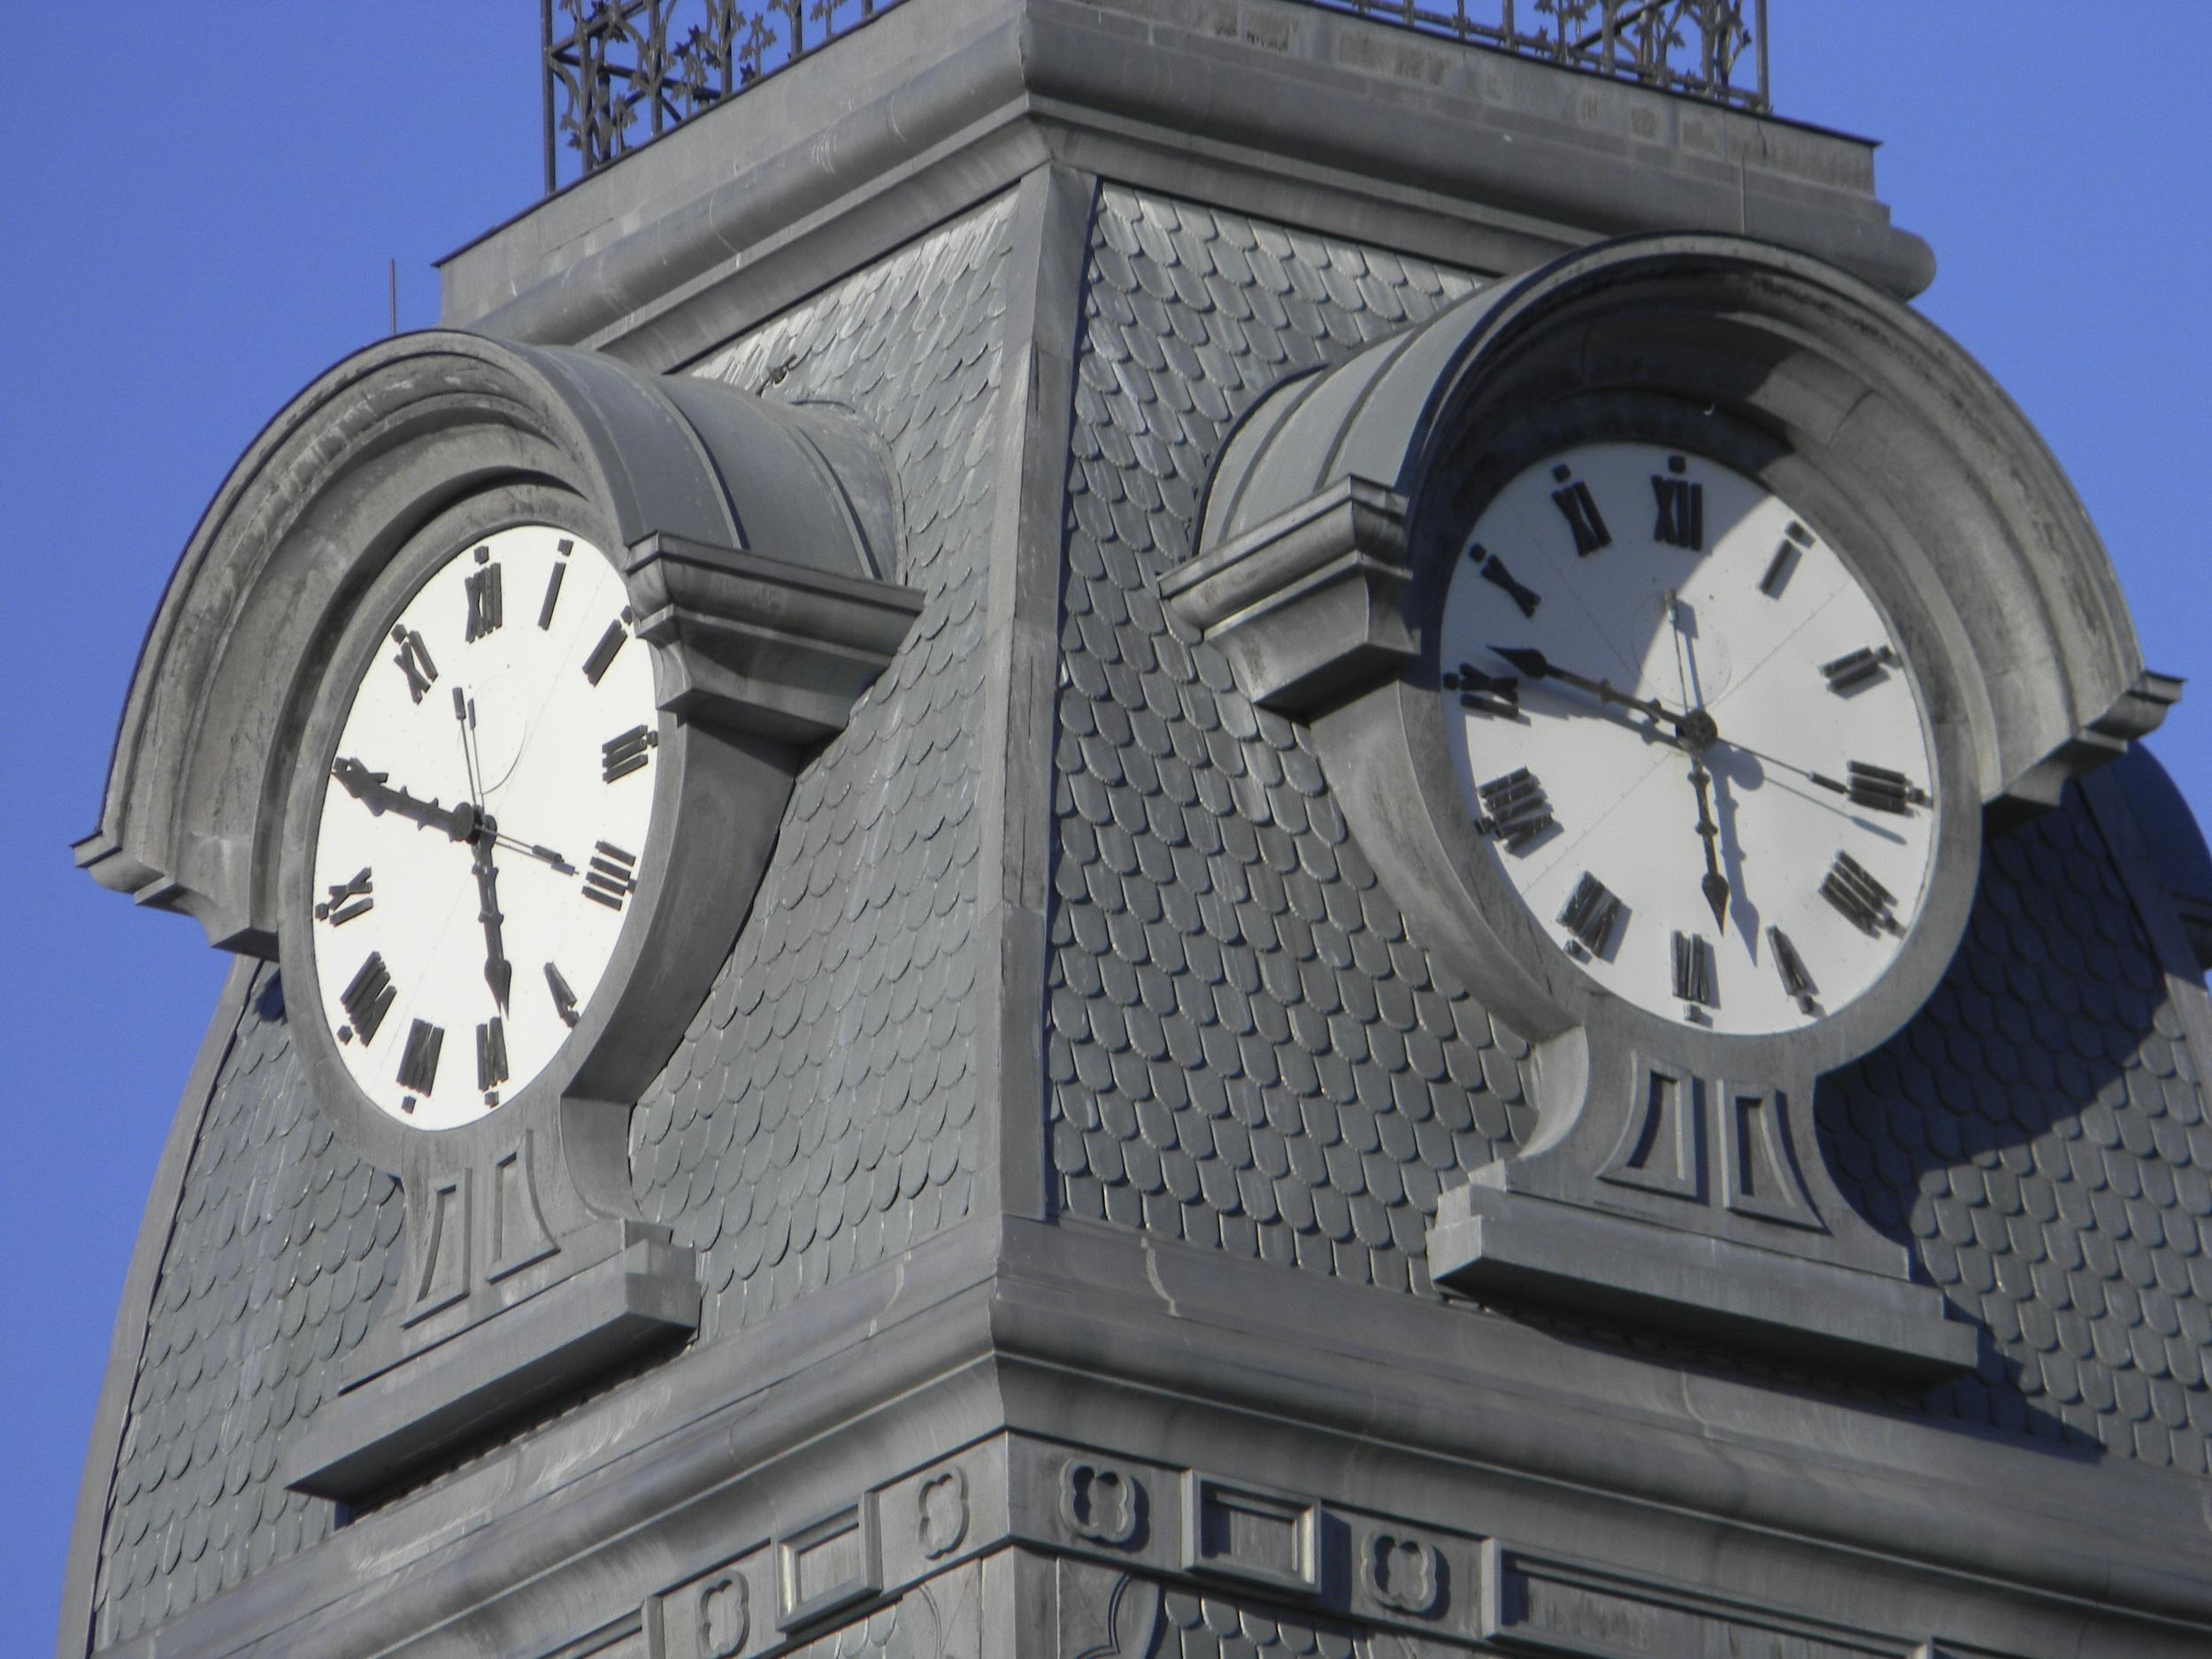 SAC_TX_HOOD_GRANBURY_courthouse_1-2012-Oct18.jpg